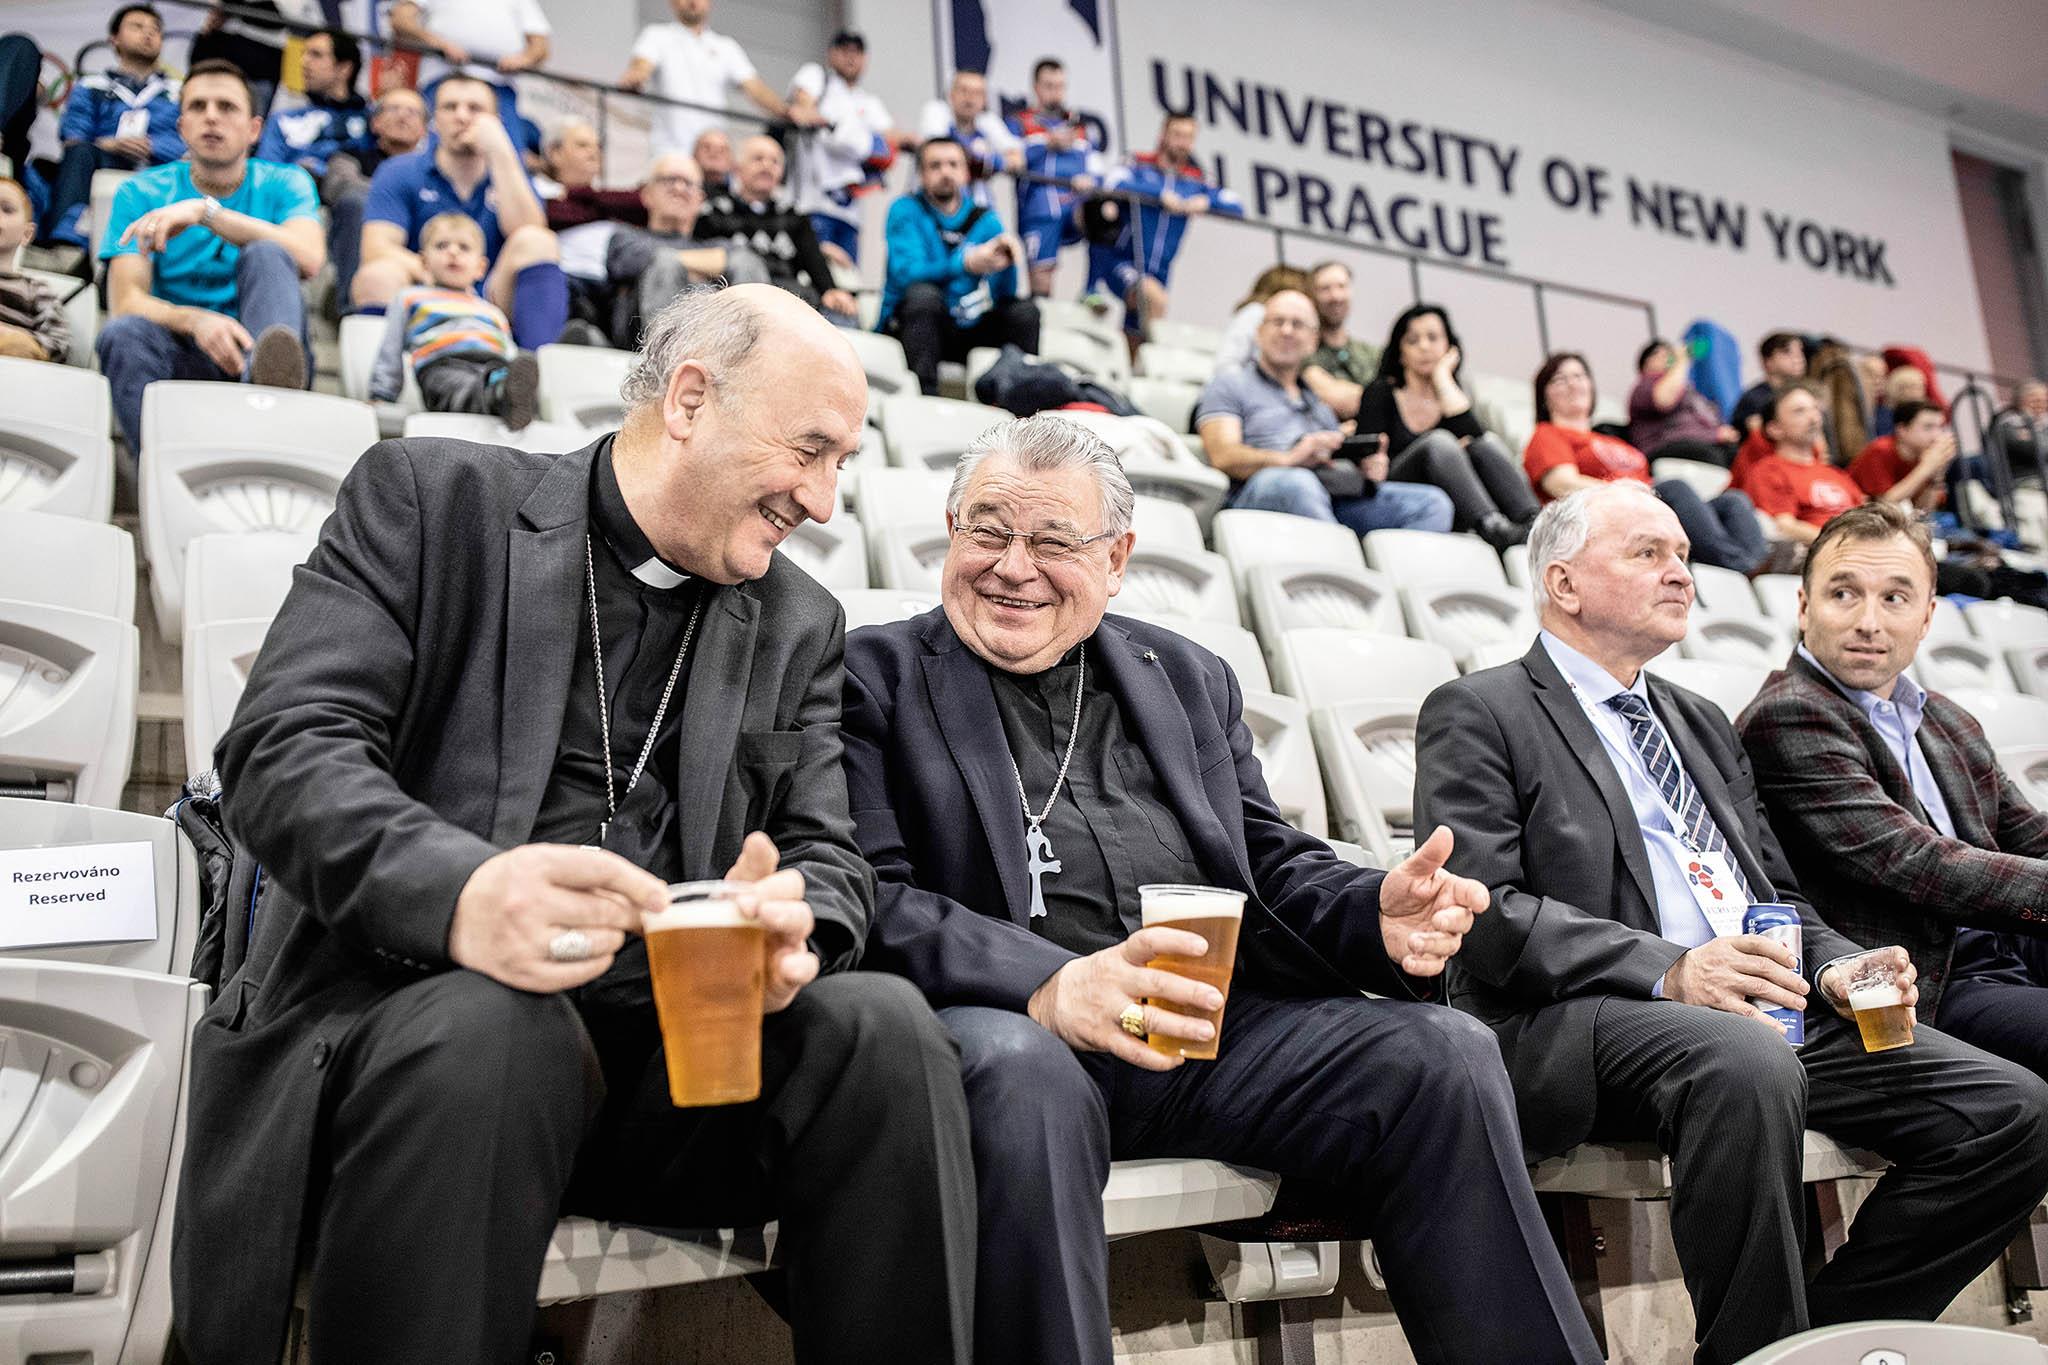 Turnaj sledovali také olomoucký arcibiskup Jan Graubner (zcela vlevo) s pražským arcibiskupem Dominikem Dukou. Pohár vítězů převzal polský tým (na snímku je Maciej Lewandowski).